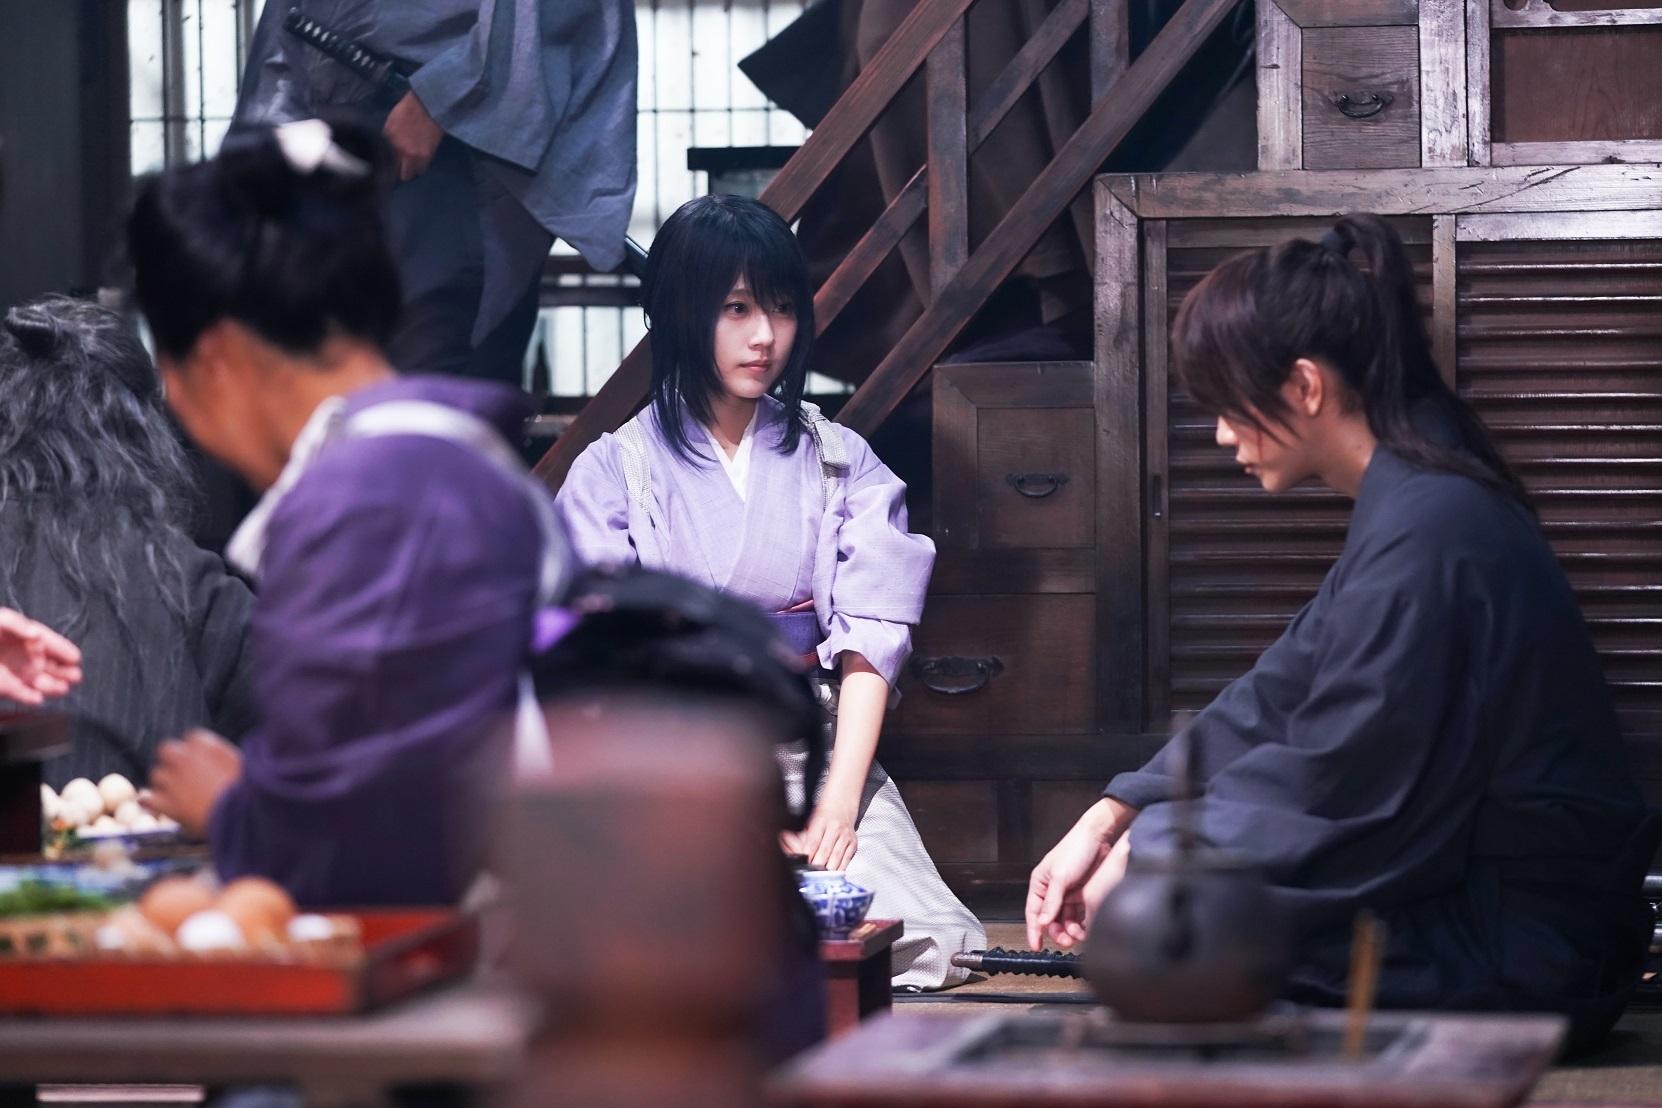 (C)和月伸宏/ 集英社(C)2020 映画「るろうに剣心 最終章 The Beginning」製作委員会